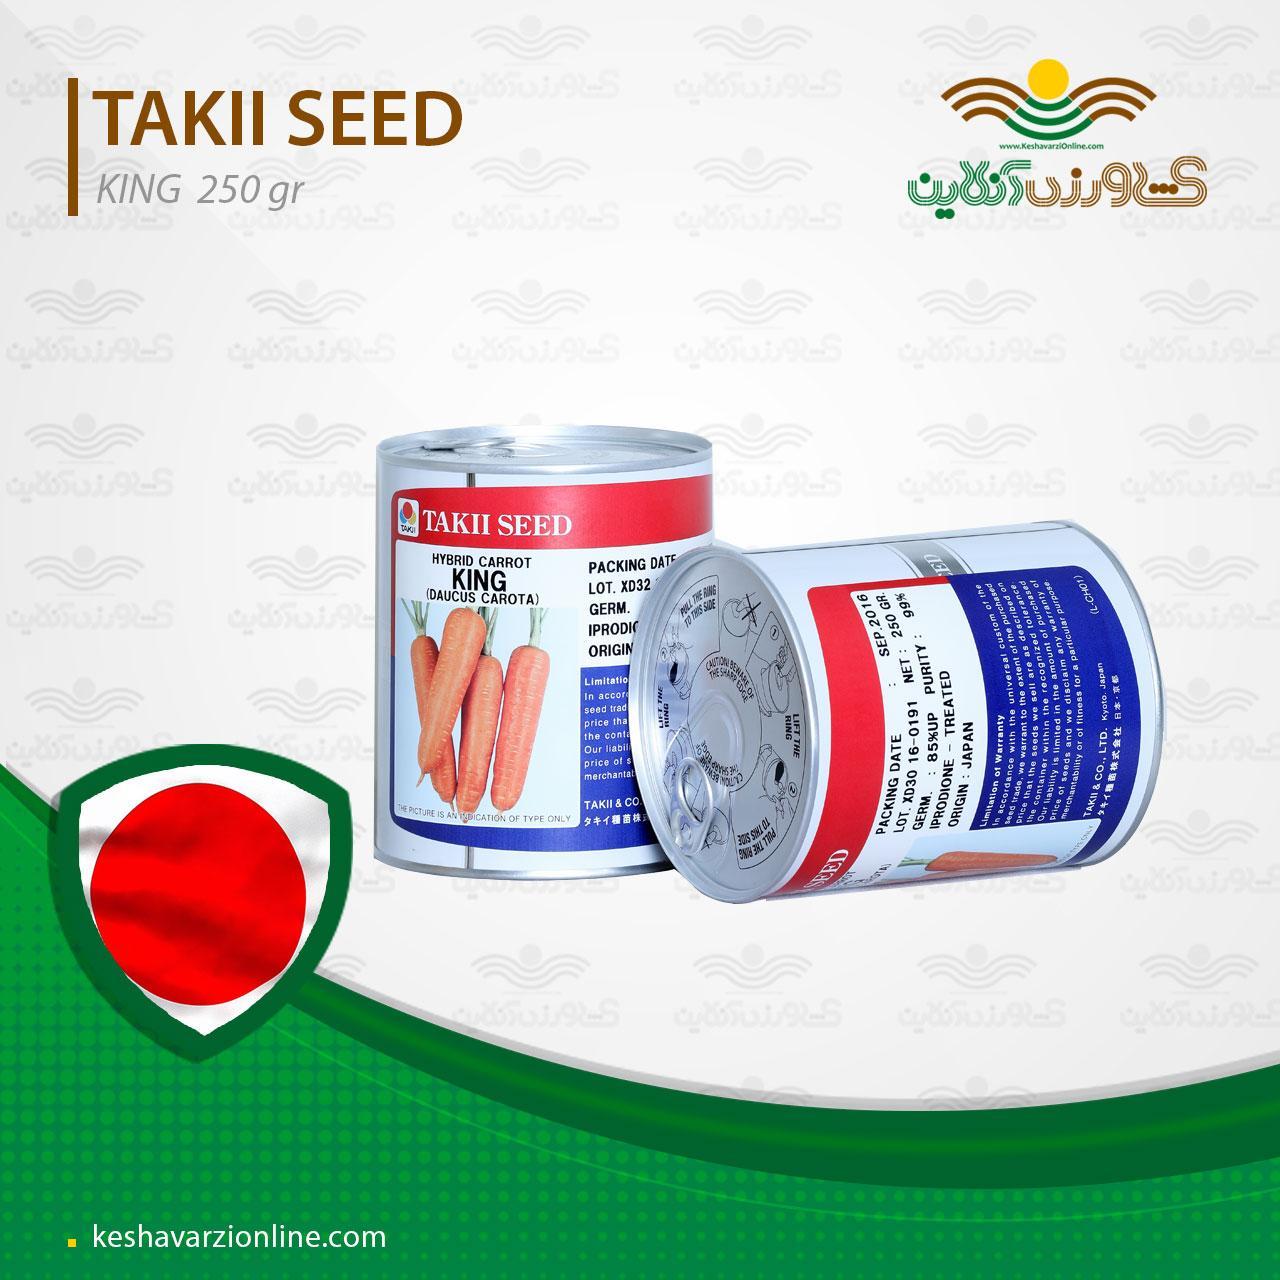 بذر هویج کینگ تاکی ژاپن 250 گرمی